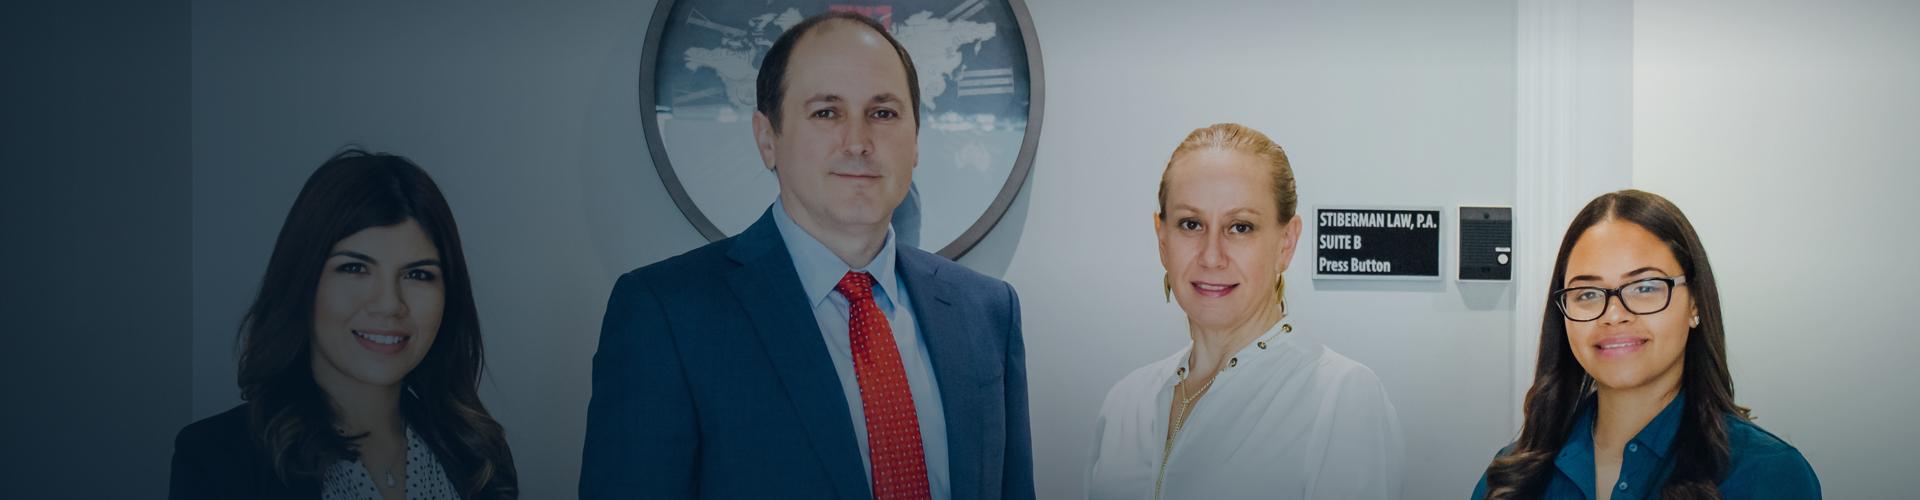 Florida Foreclosure Defense Attorneys - Stiberman Law Firm